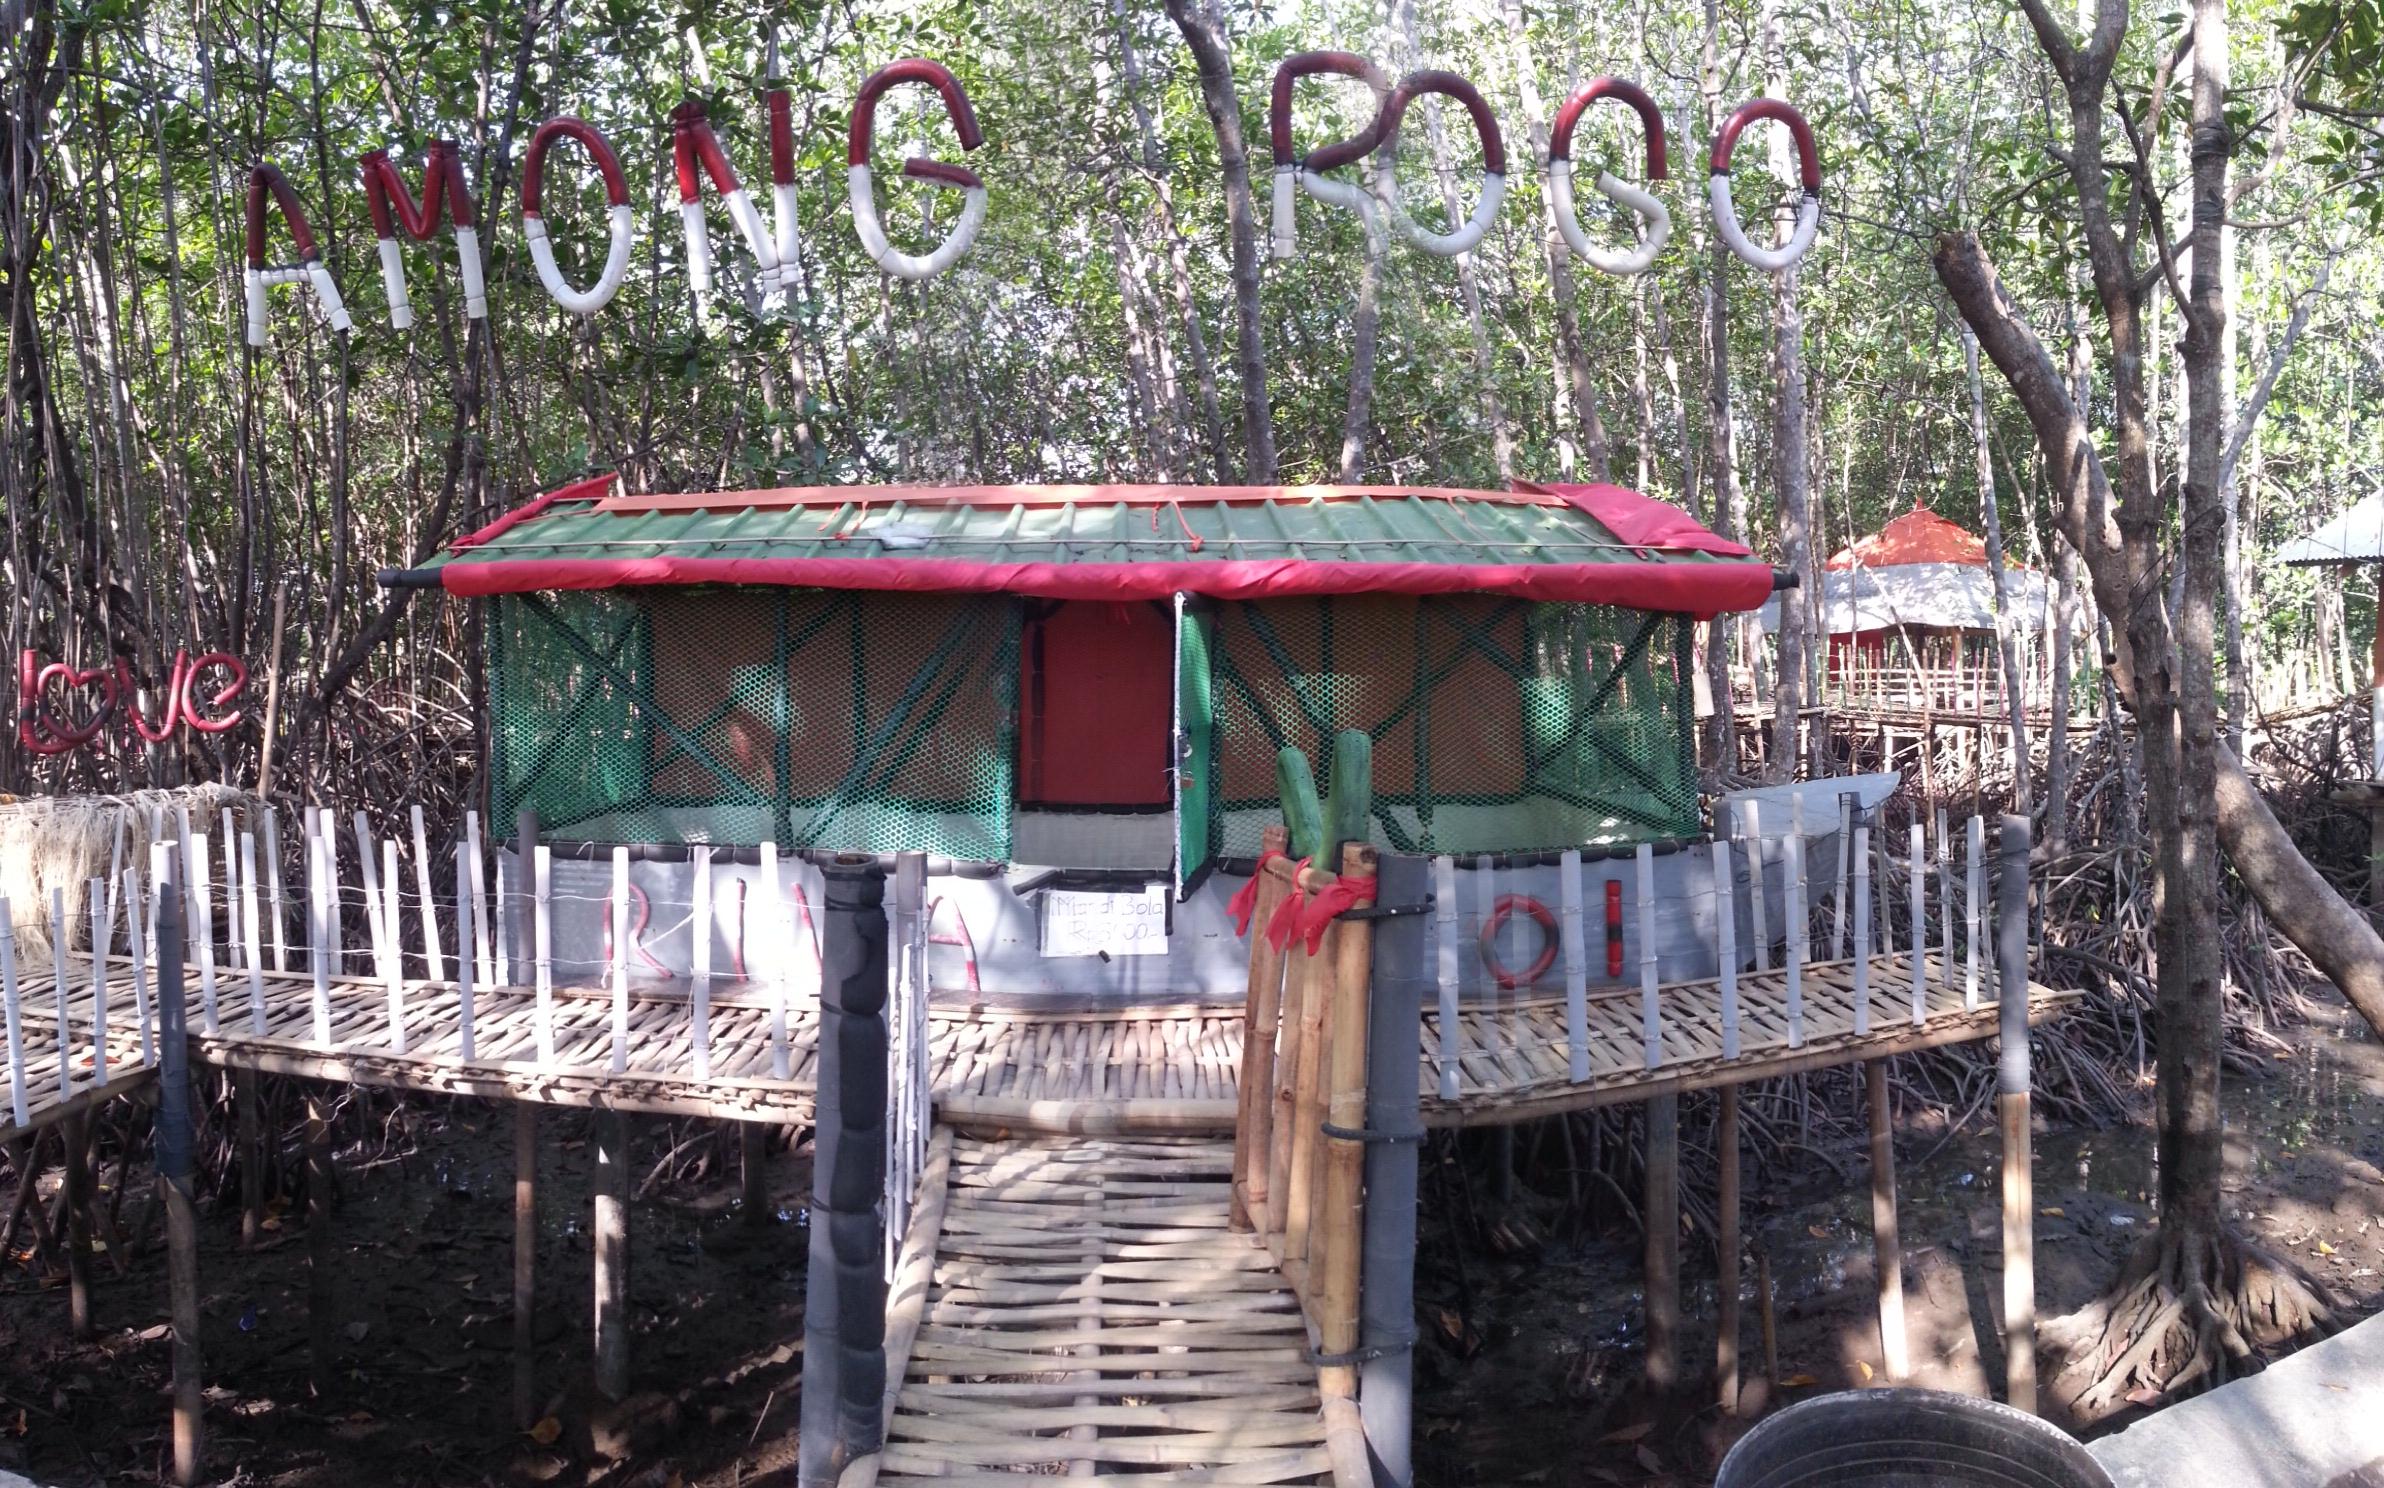 Wisata Hutan Payau Cilacap Samz Beltriverson Image Mangrove Kab